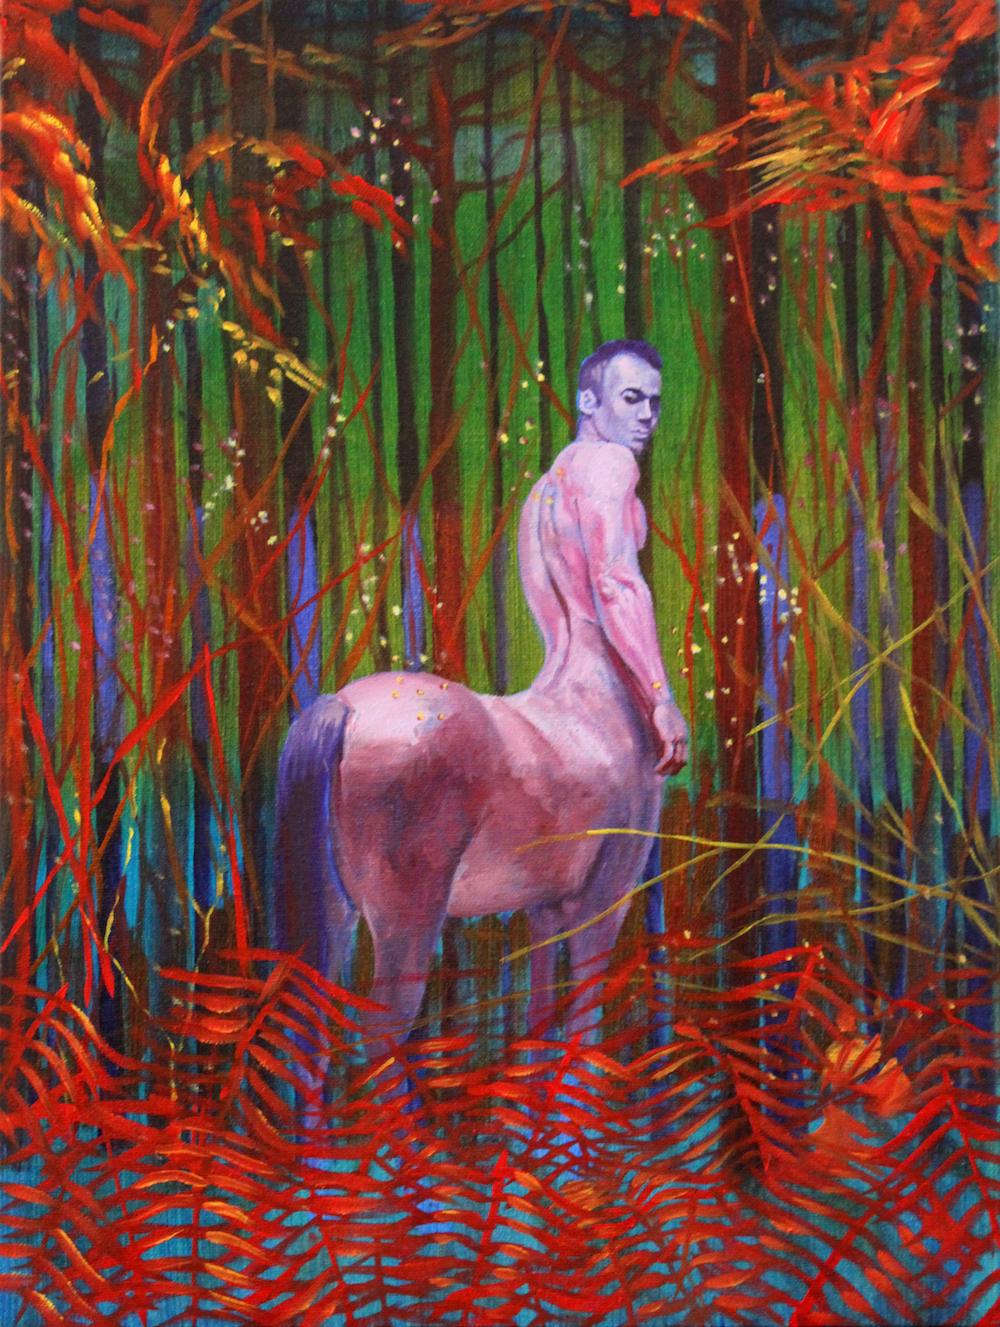 Mark Liam Smith_Crimson Stallion_oil on canvas_16x12 inches_2017.jpg